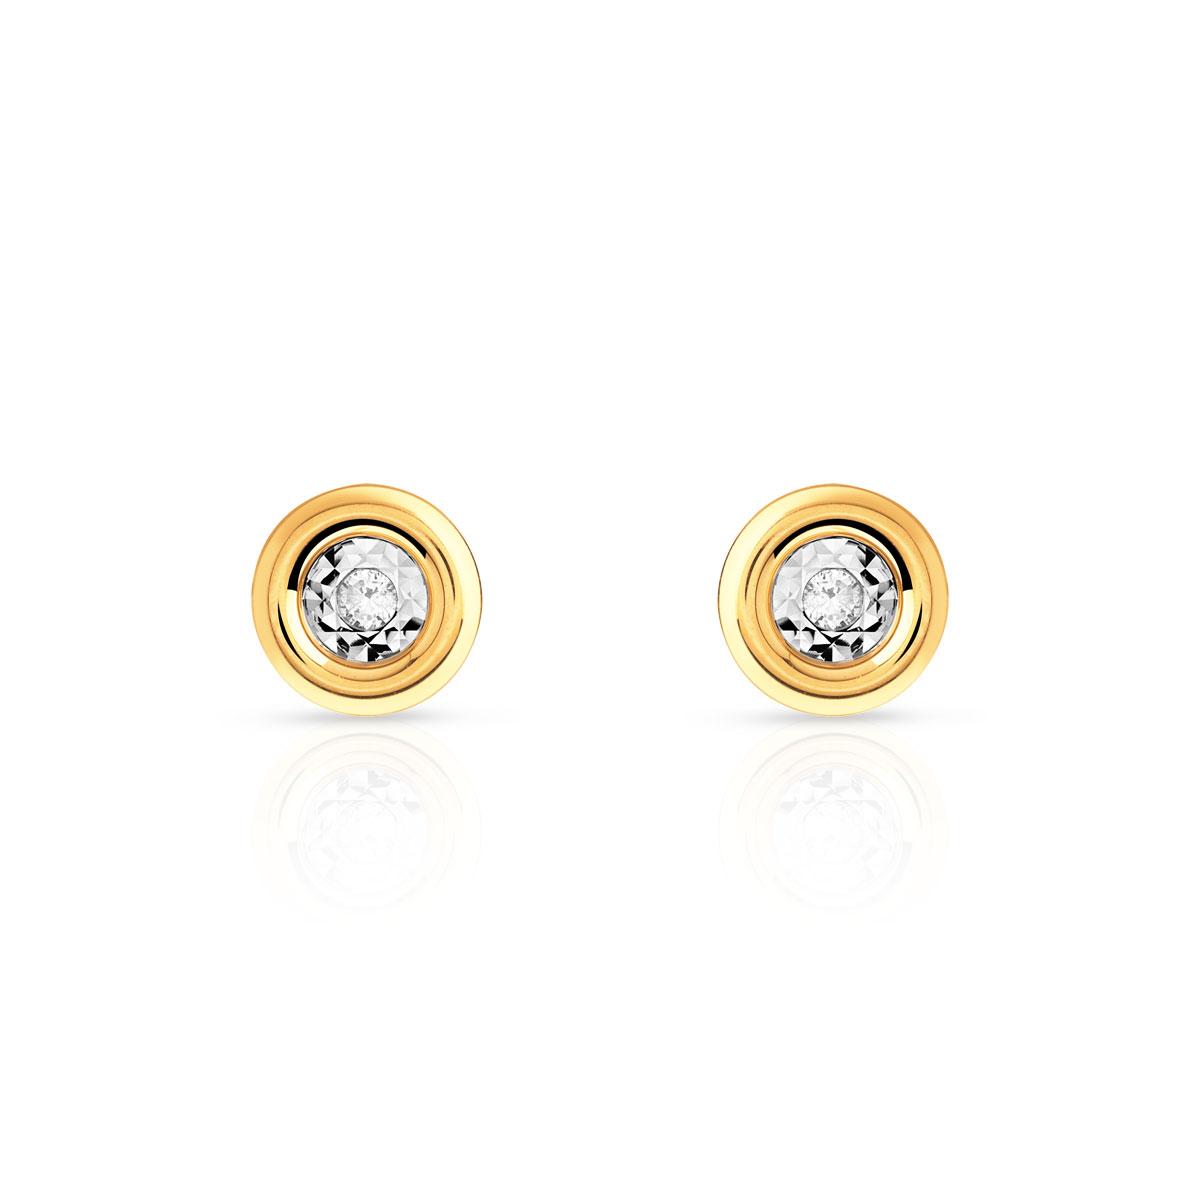 boucles d'oreille diamant or jaune